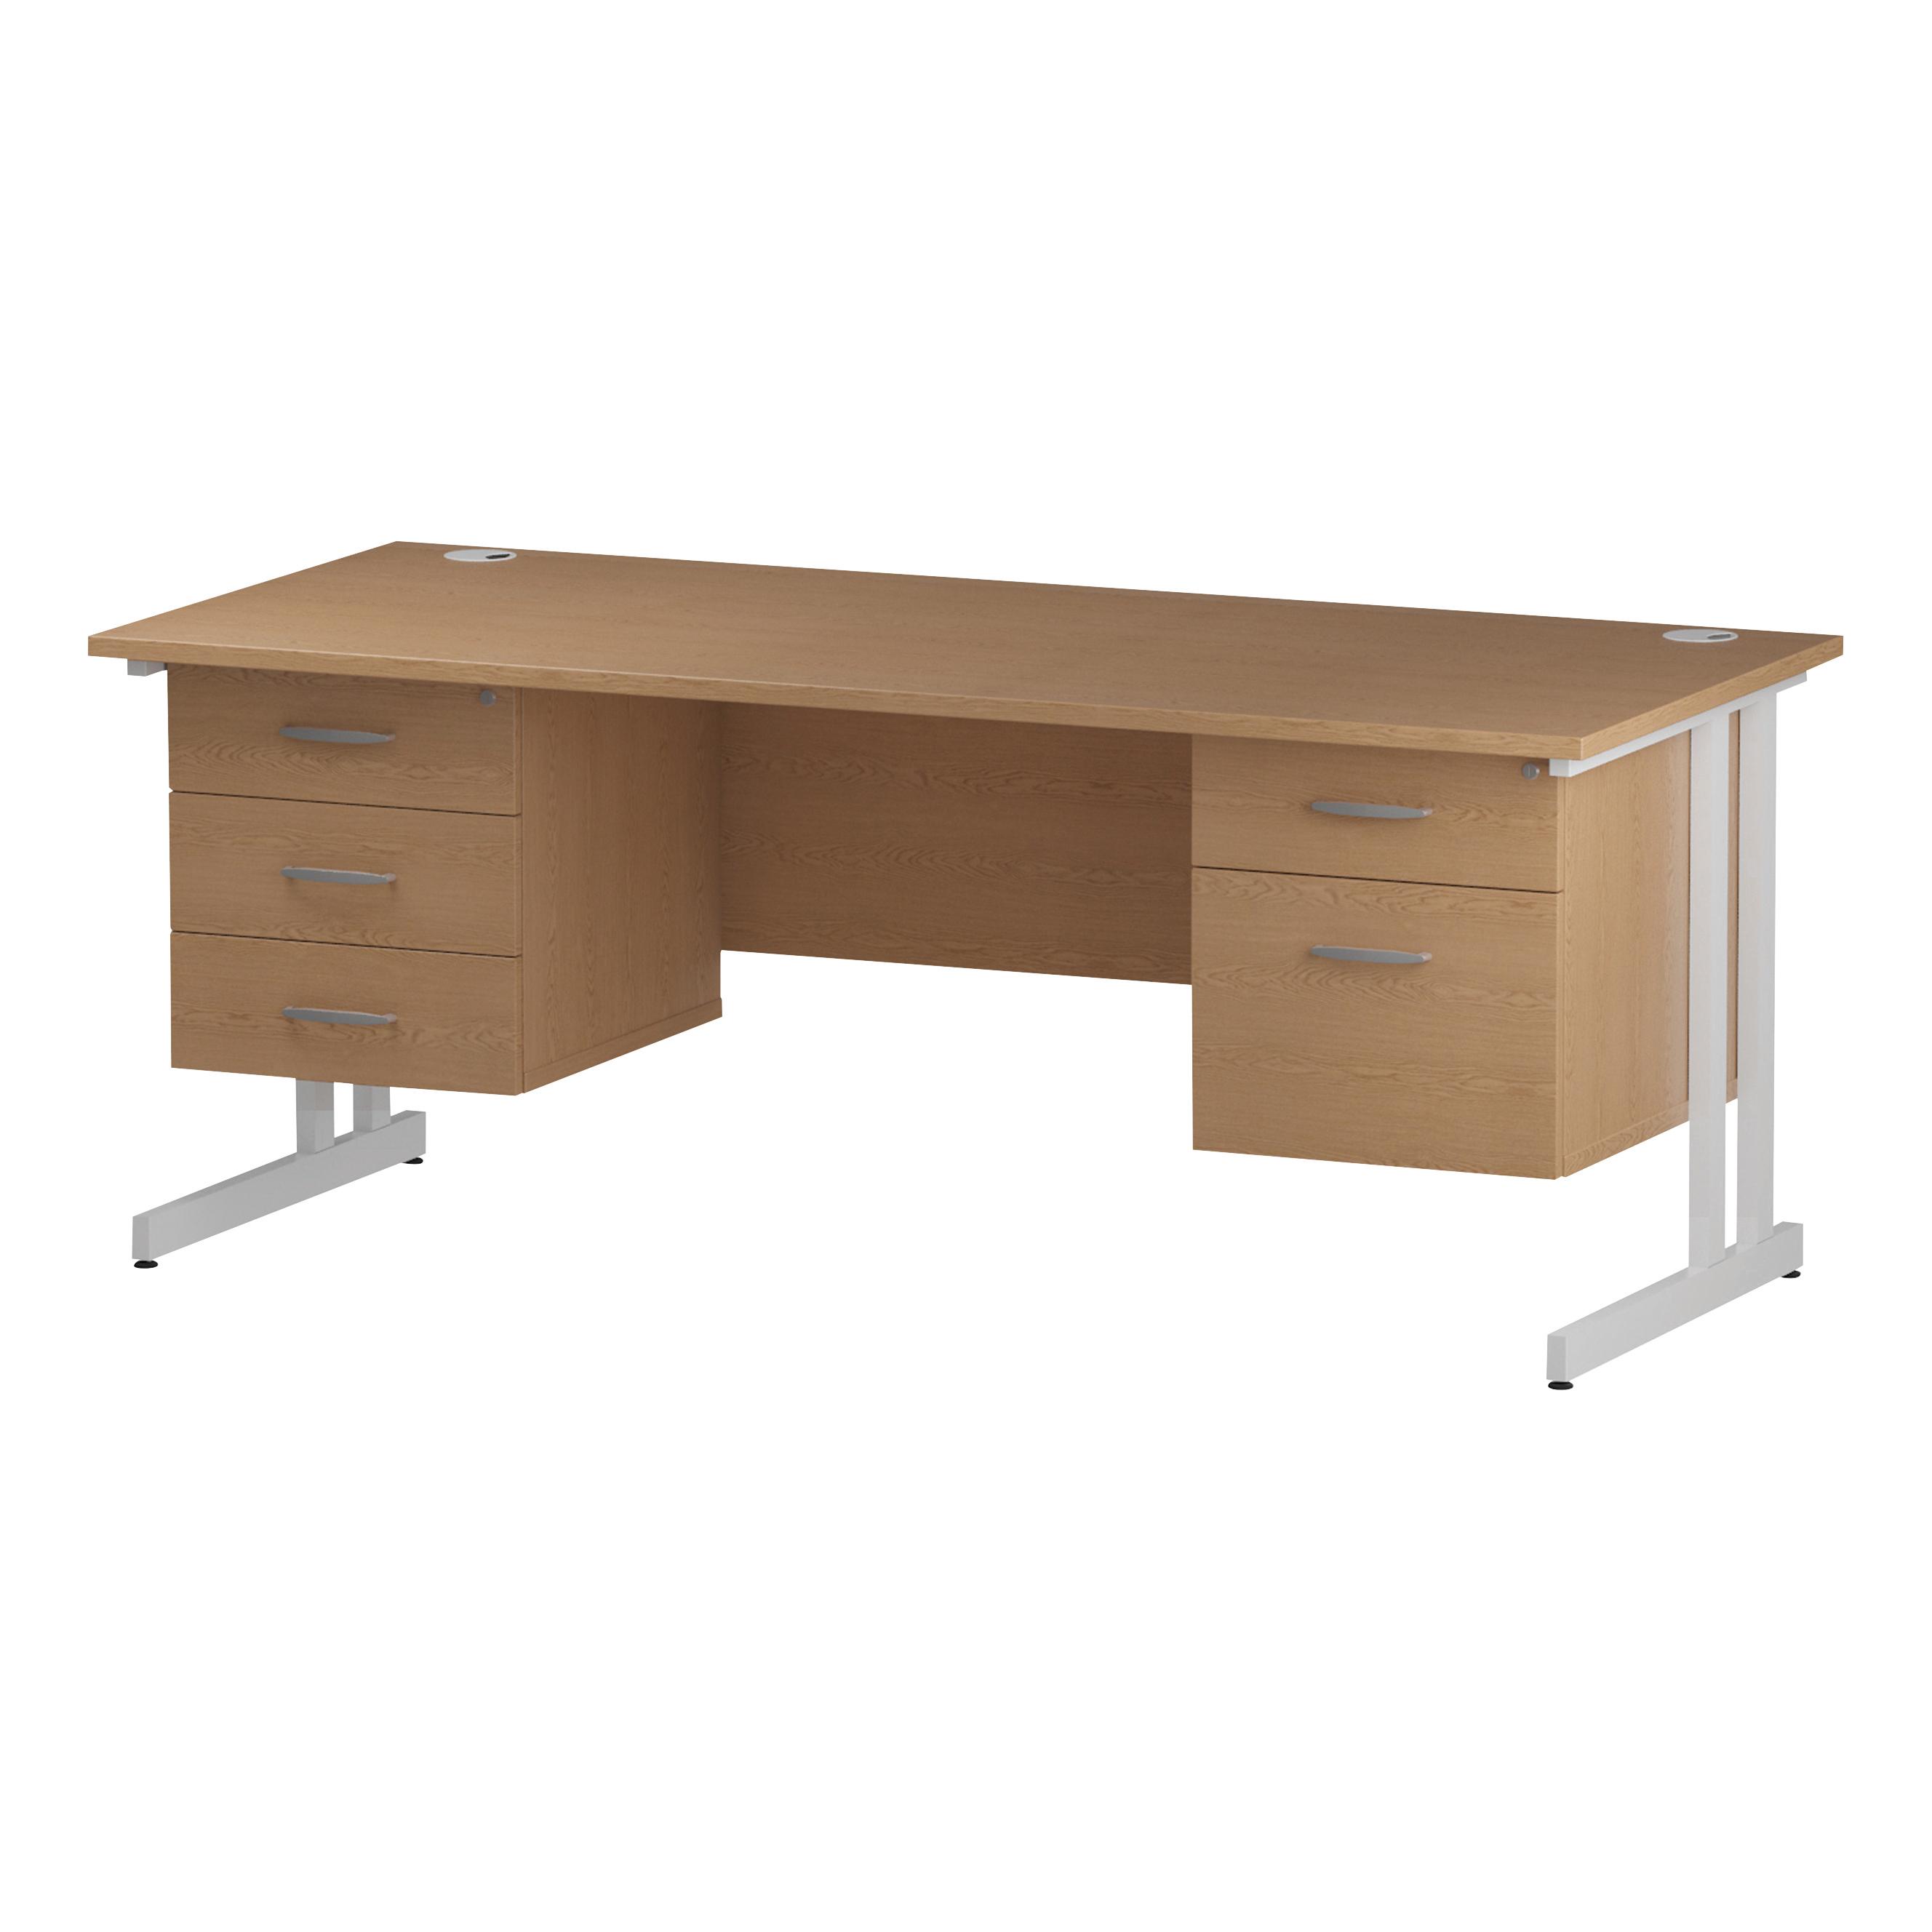 Trexus Rectangular Desk White Cantilever Leg 1800x800mm Double Fixed Ped 2&3 Drawers Oak Ref I002696